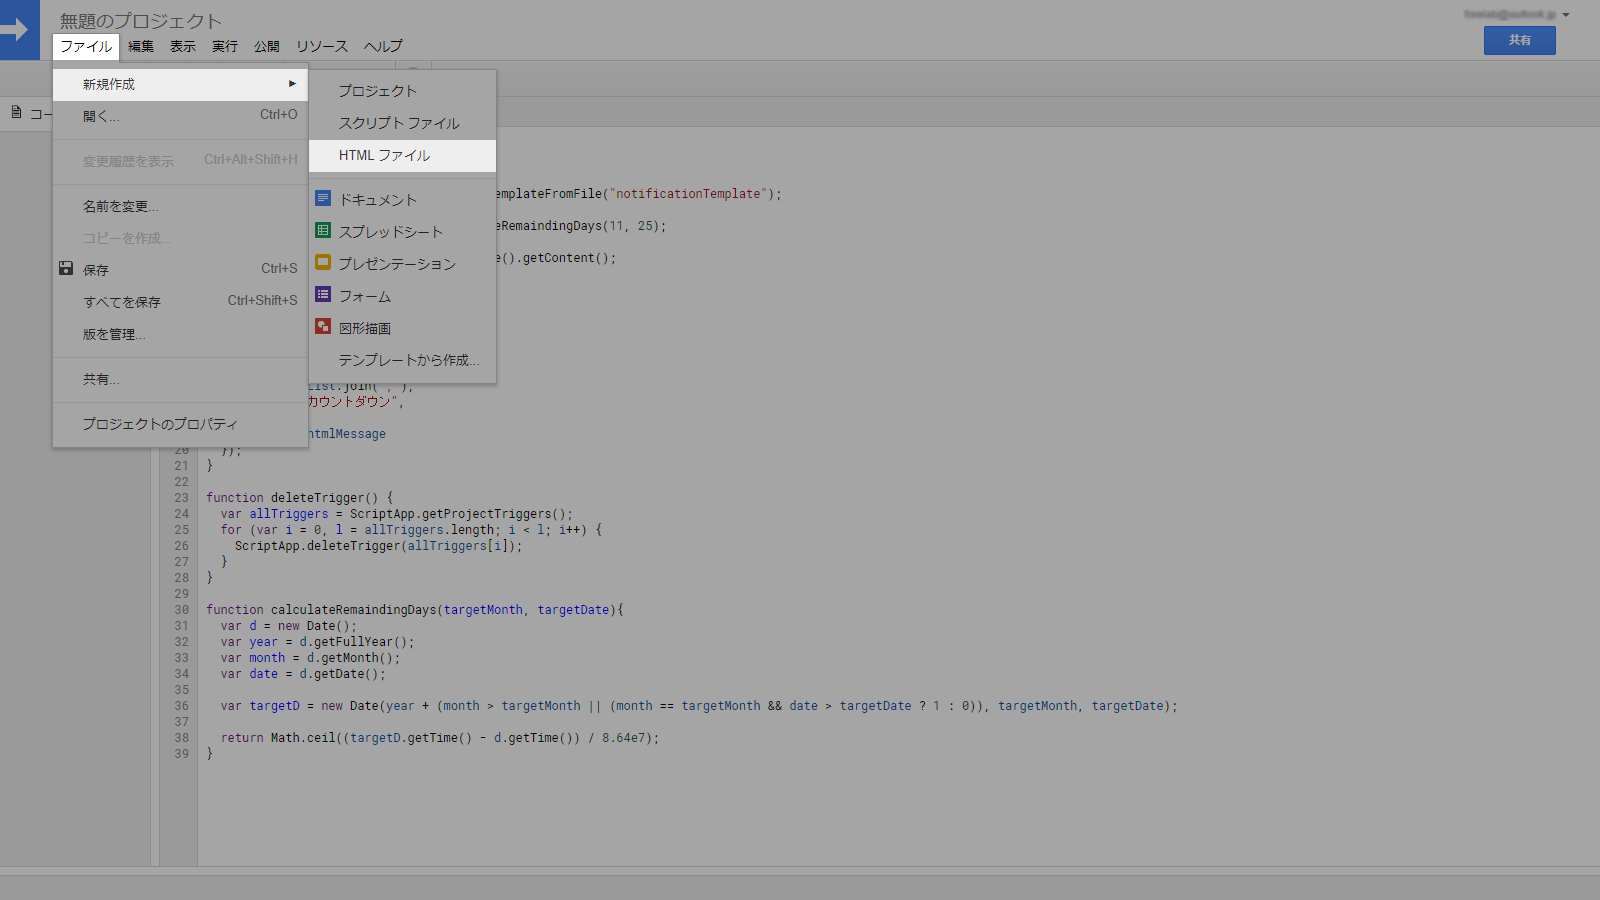 html テンプレートファイルを作成